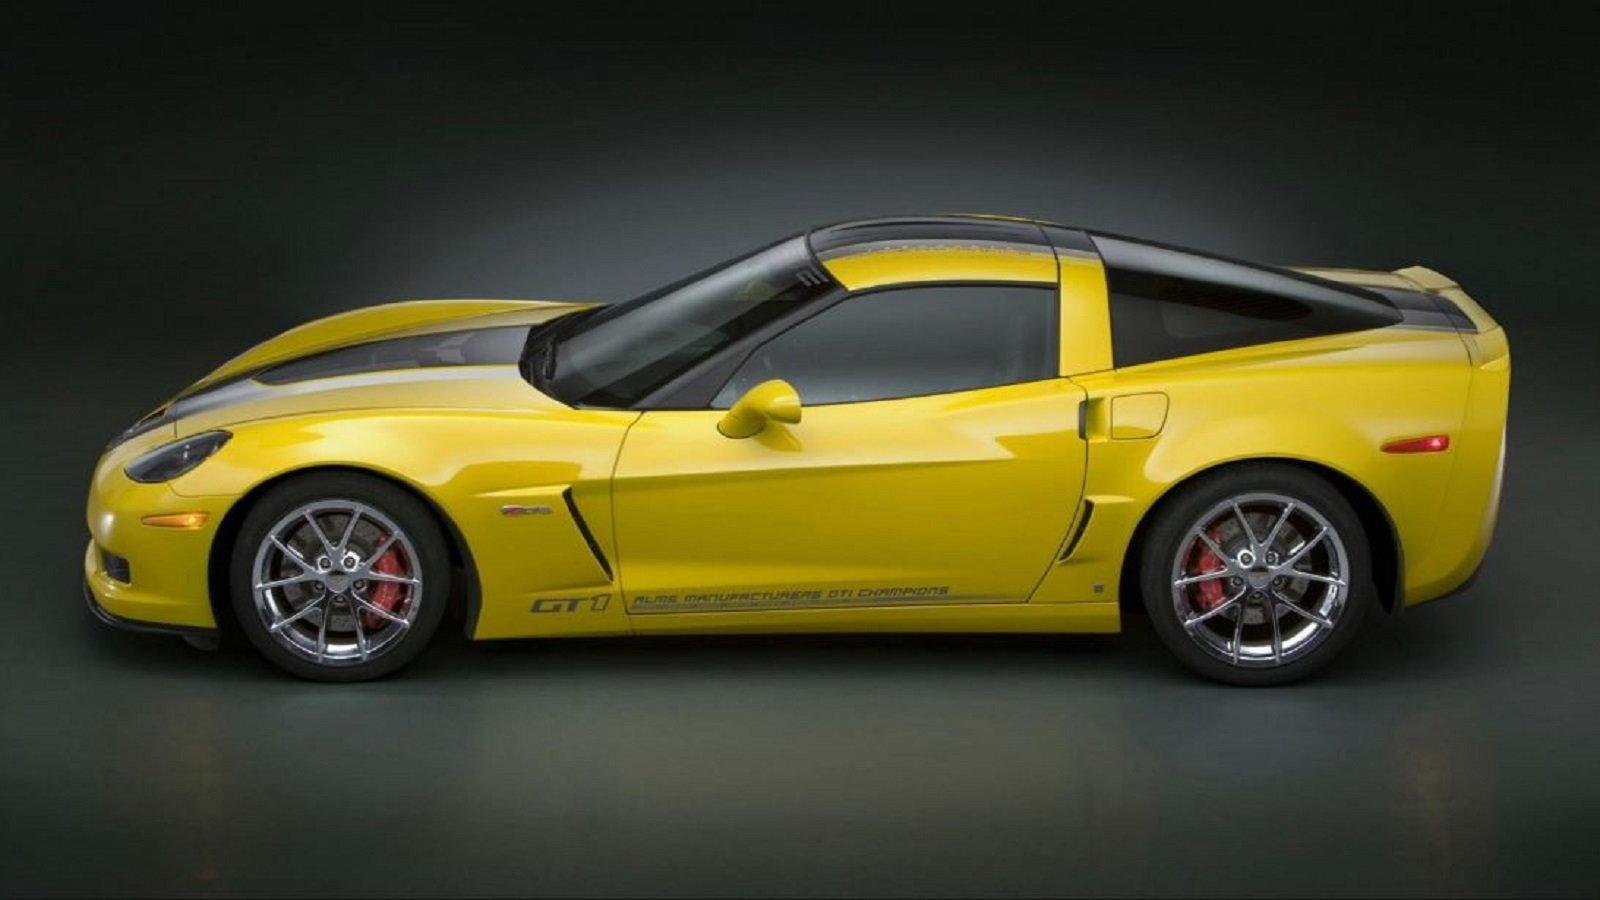 2009 GT1